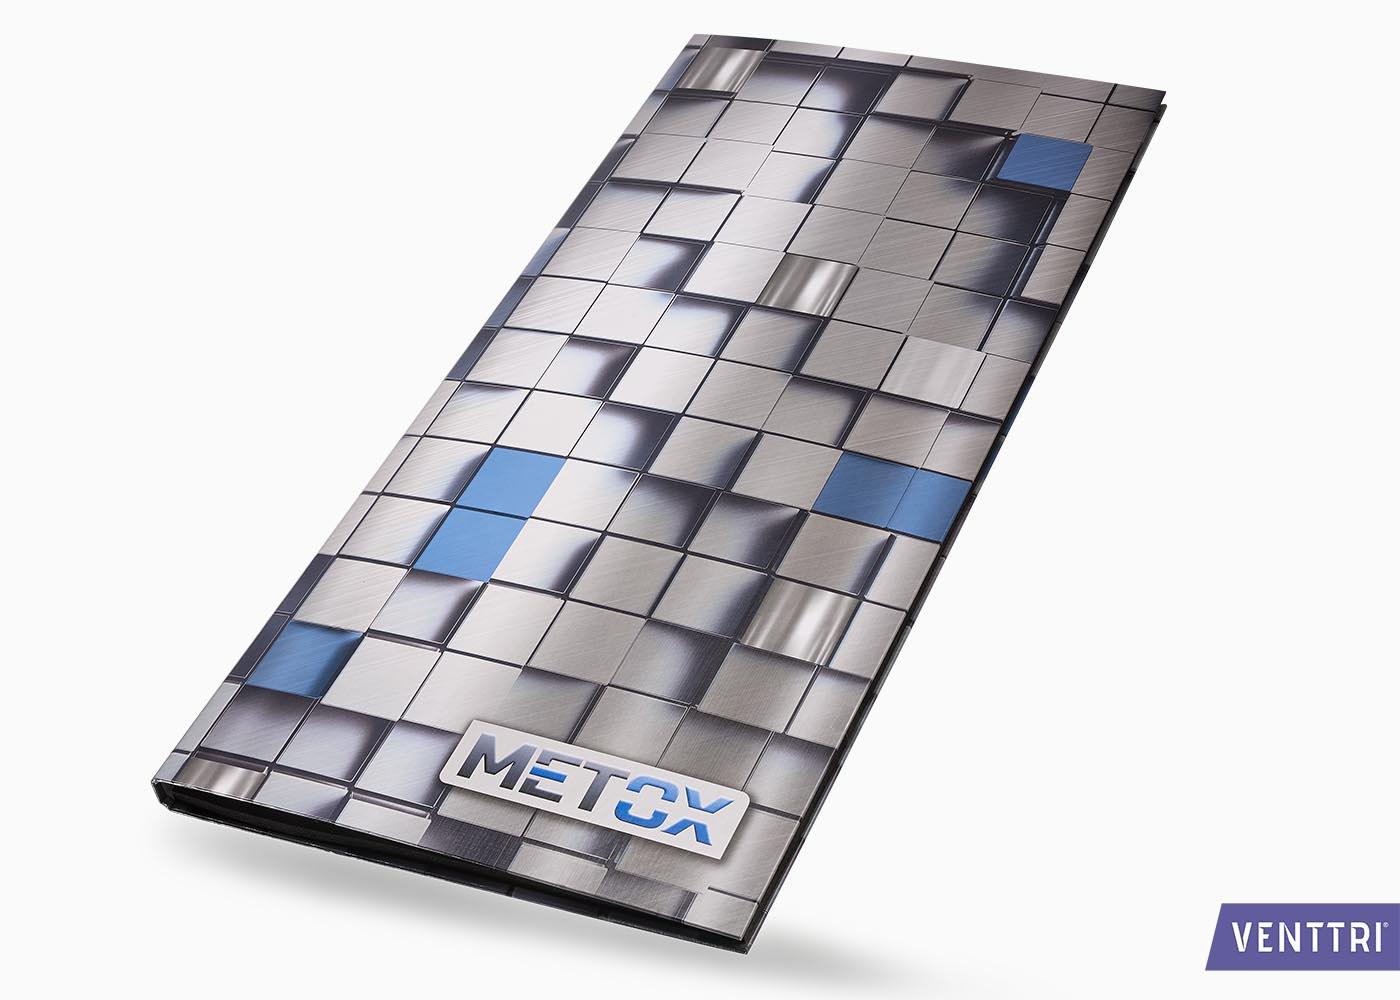 Stalenmap Metox